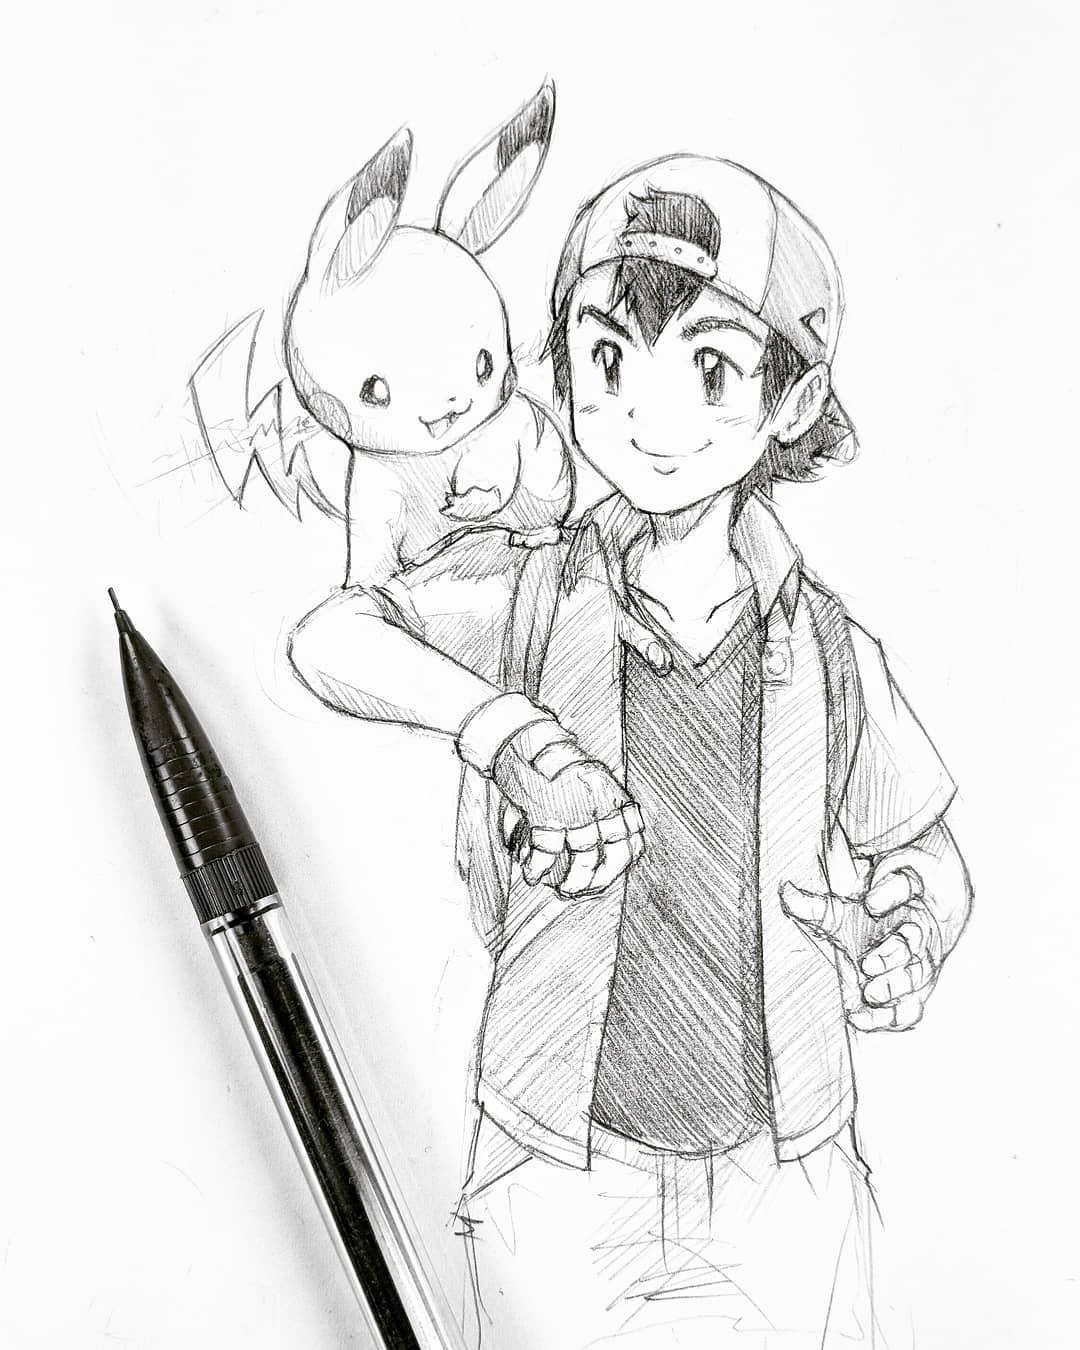 Pikachu pencil drawing